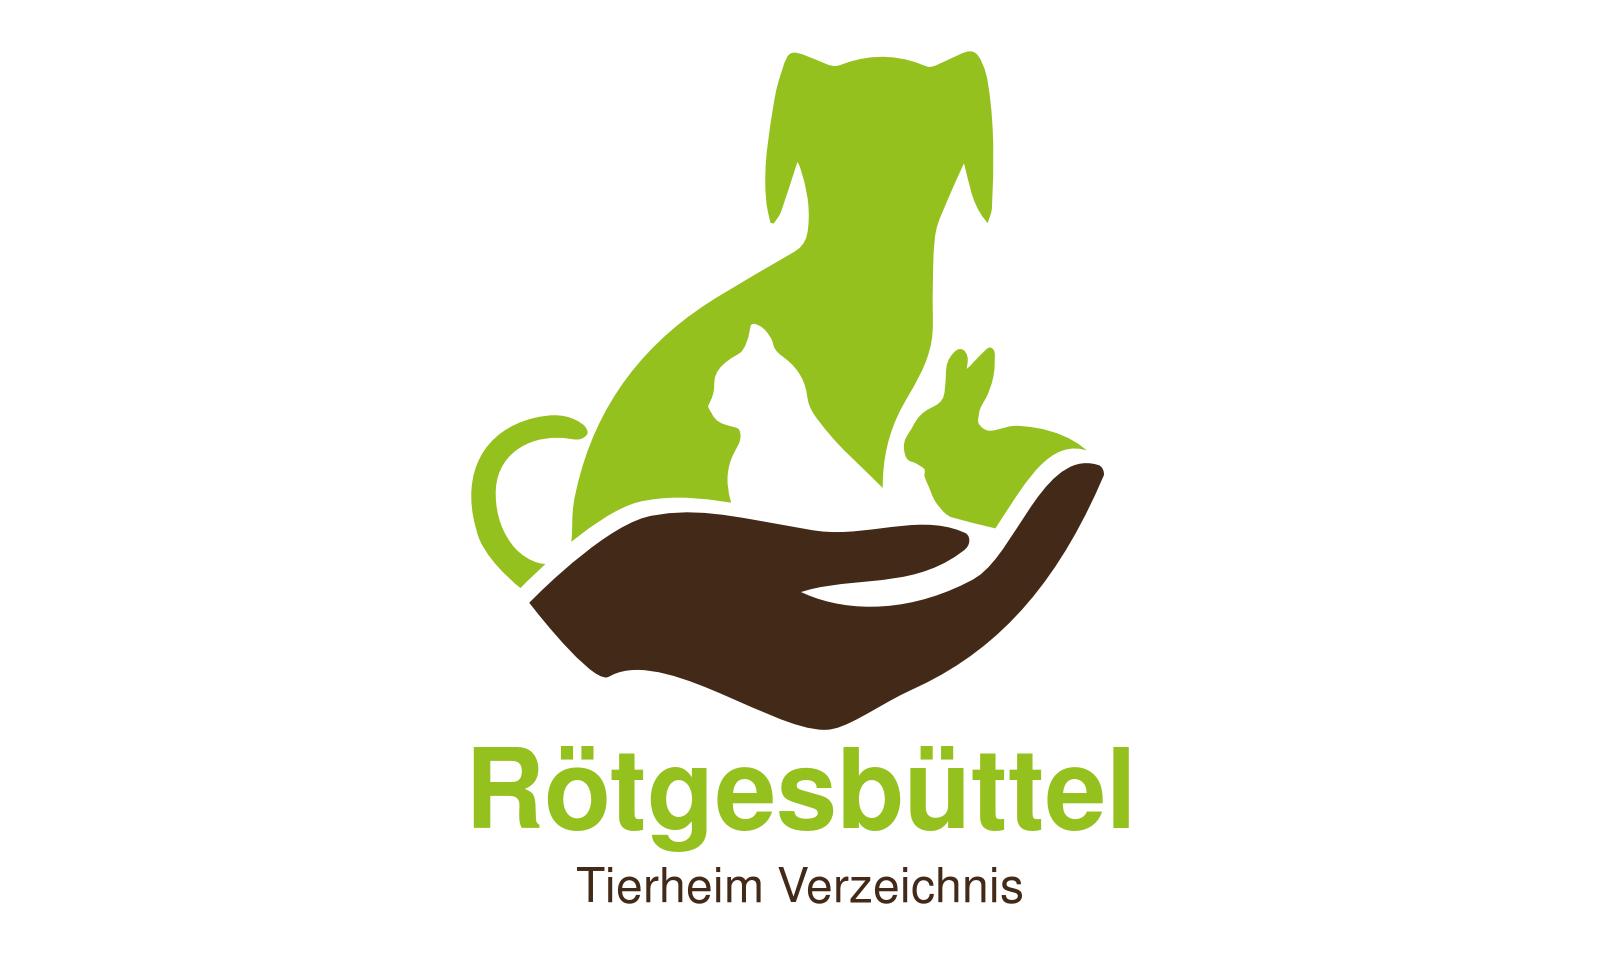 Tierheim Rötgesbüttel